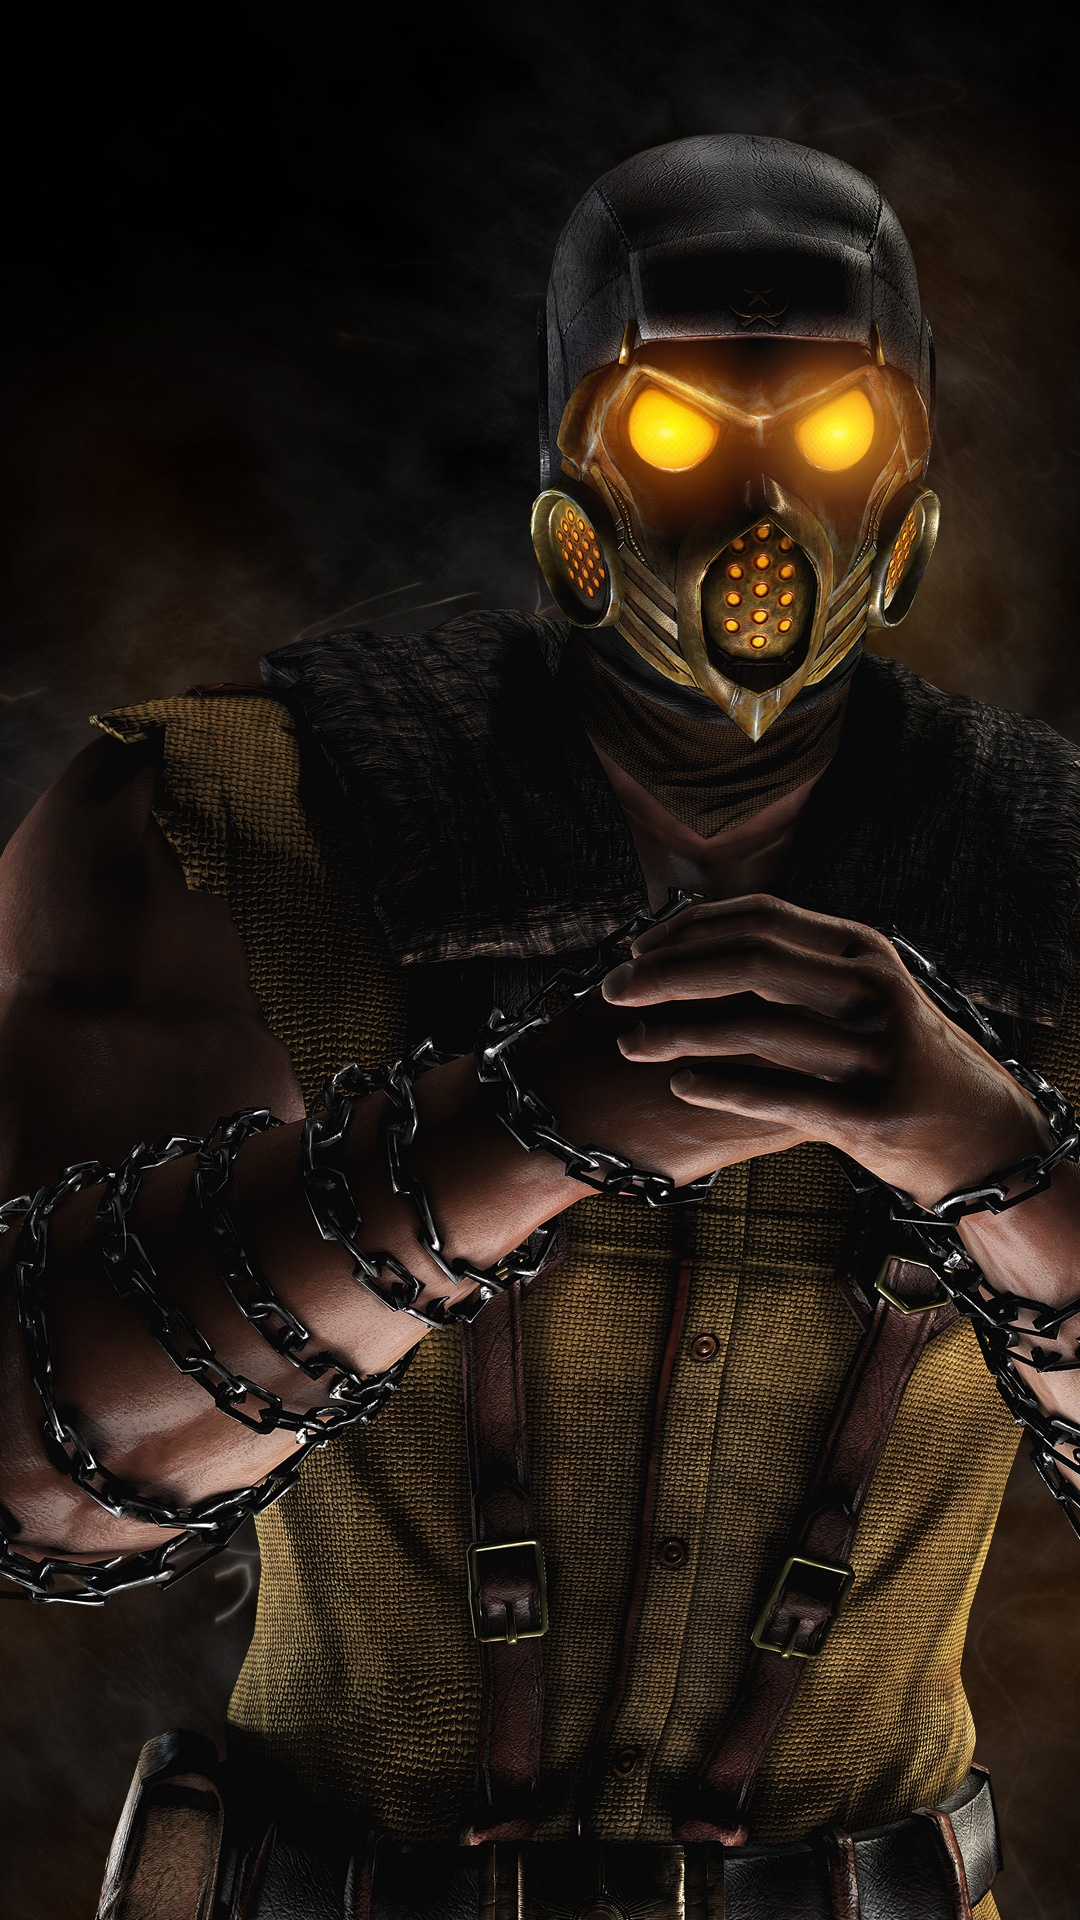 Scorpion Mortal Kombat X Game Wallpapers In Jpg Format For Free